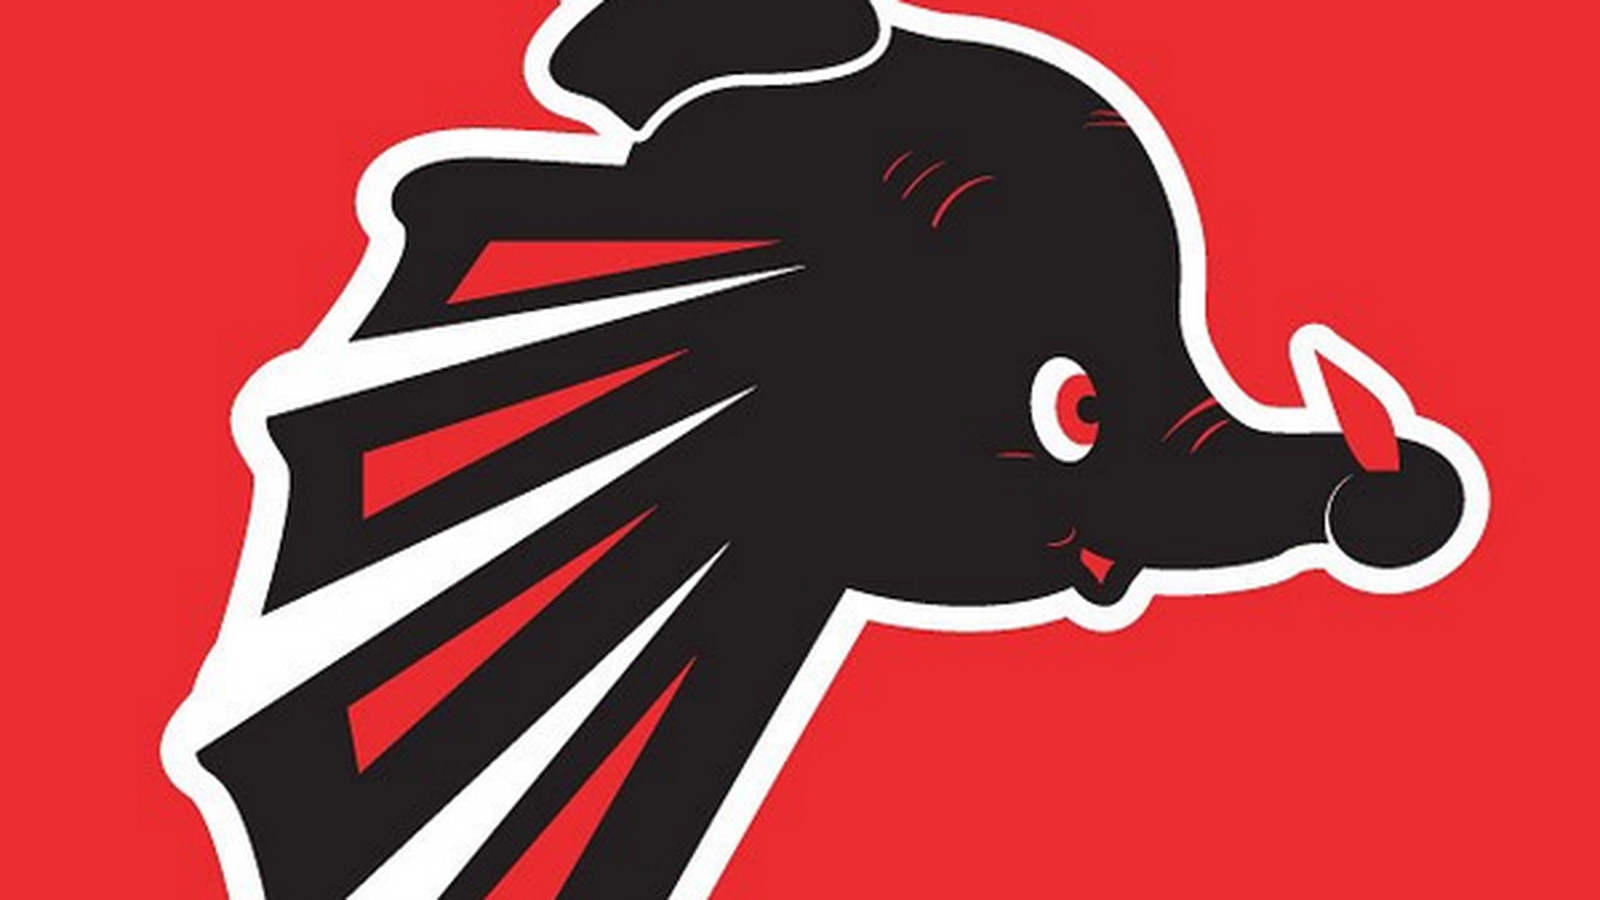 These Disney mashup NFL logos are wonderful - SBNation.com